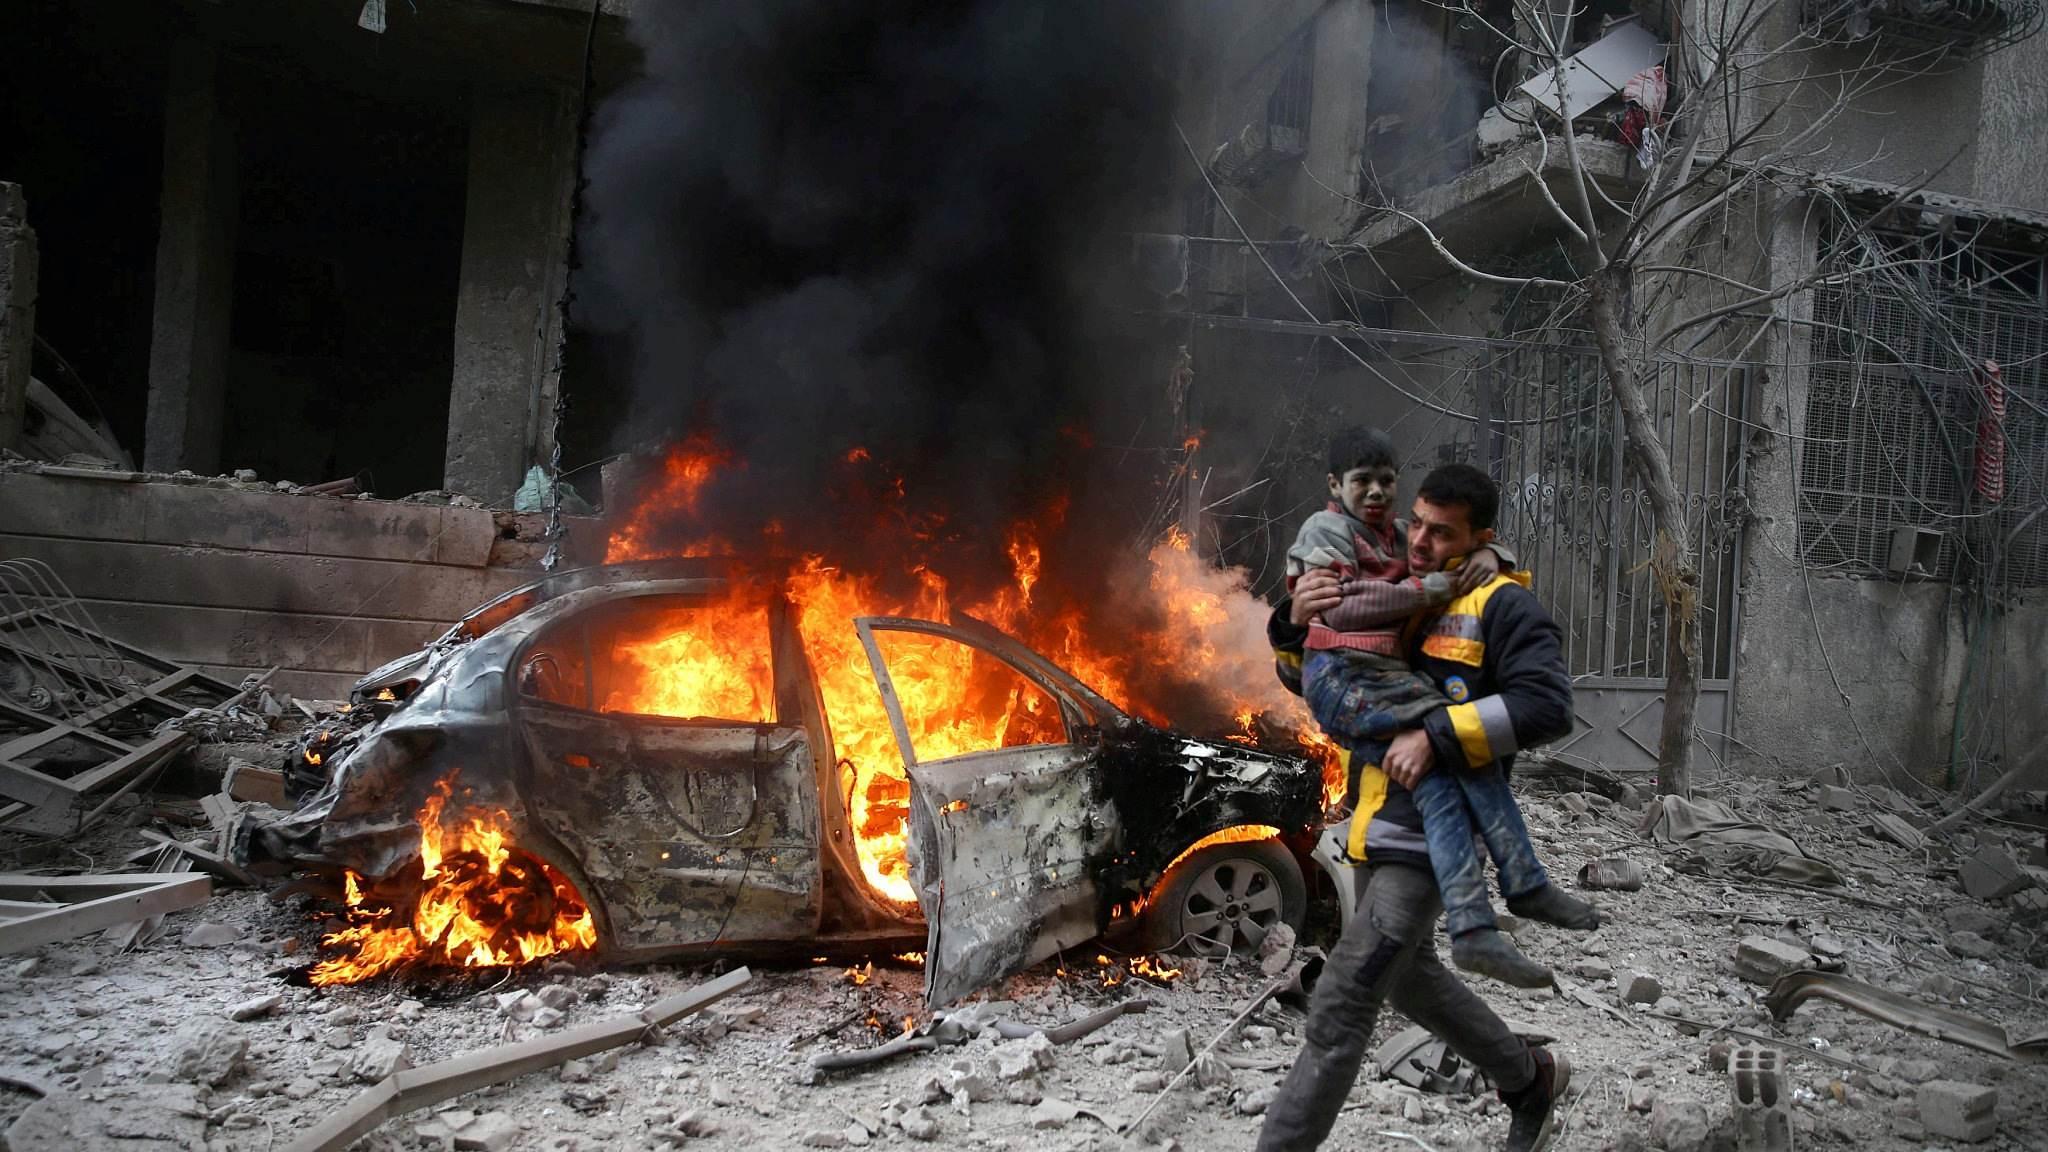 Round 11 of Syria peace talks in Astana